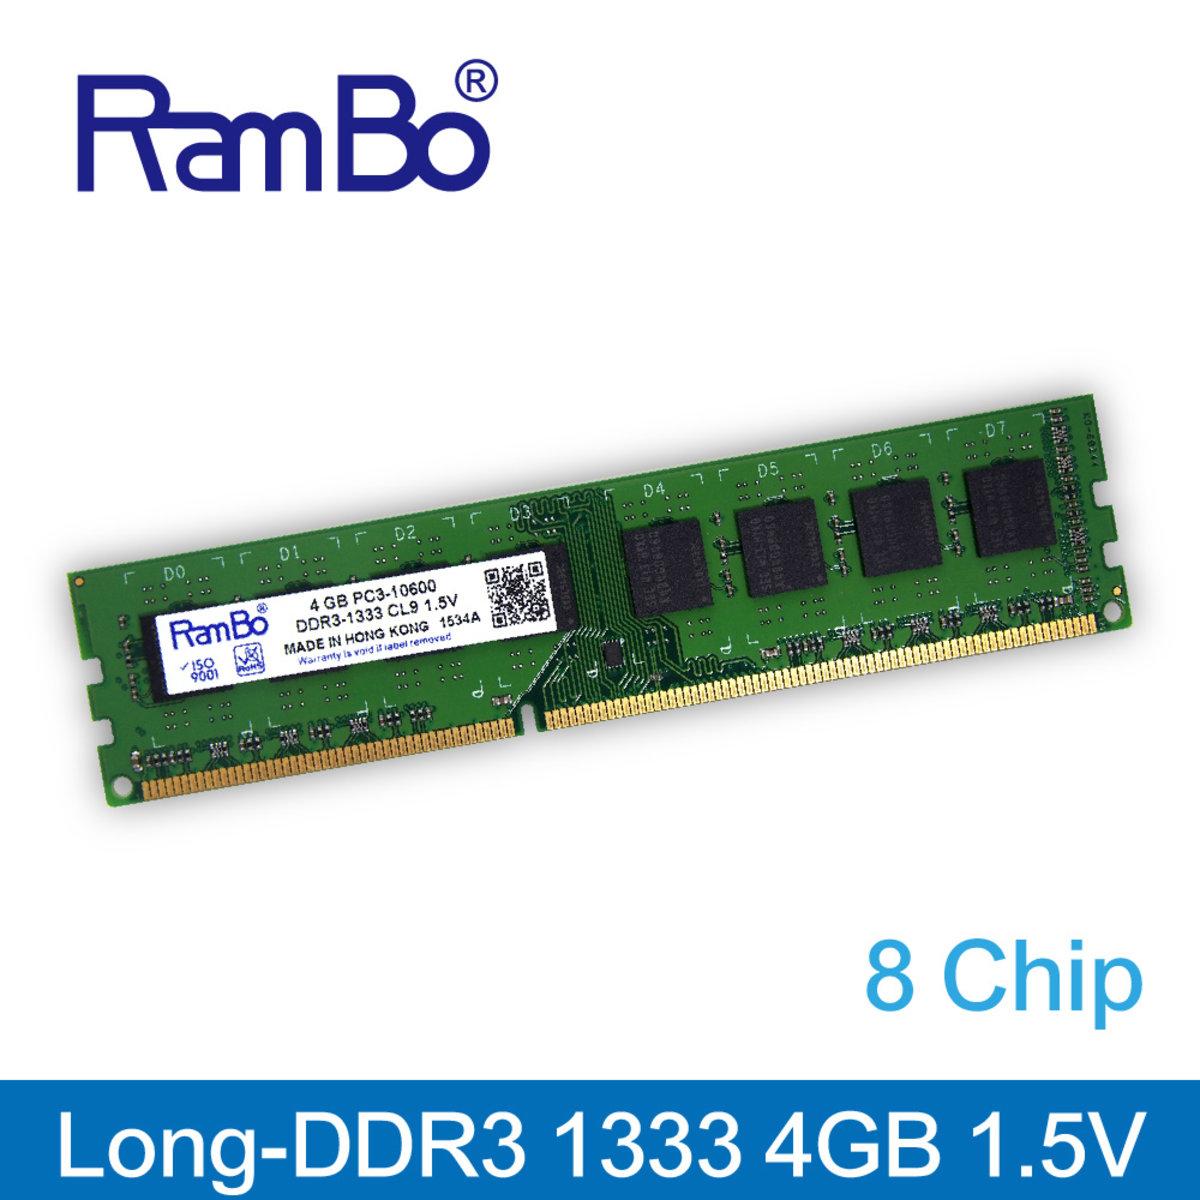 4GB DDR3 1333MHz Long DIMM 8-Chip(單面) 1.5V 記憶體 內存條 台式電腦適用 PC